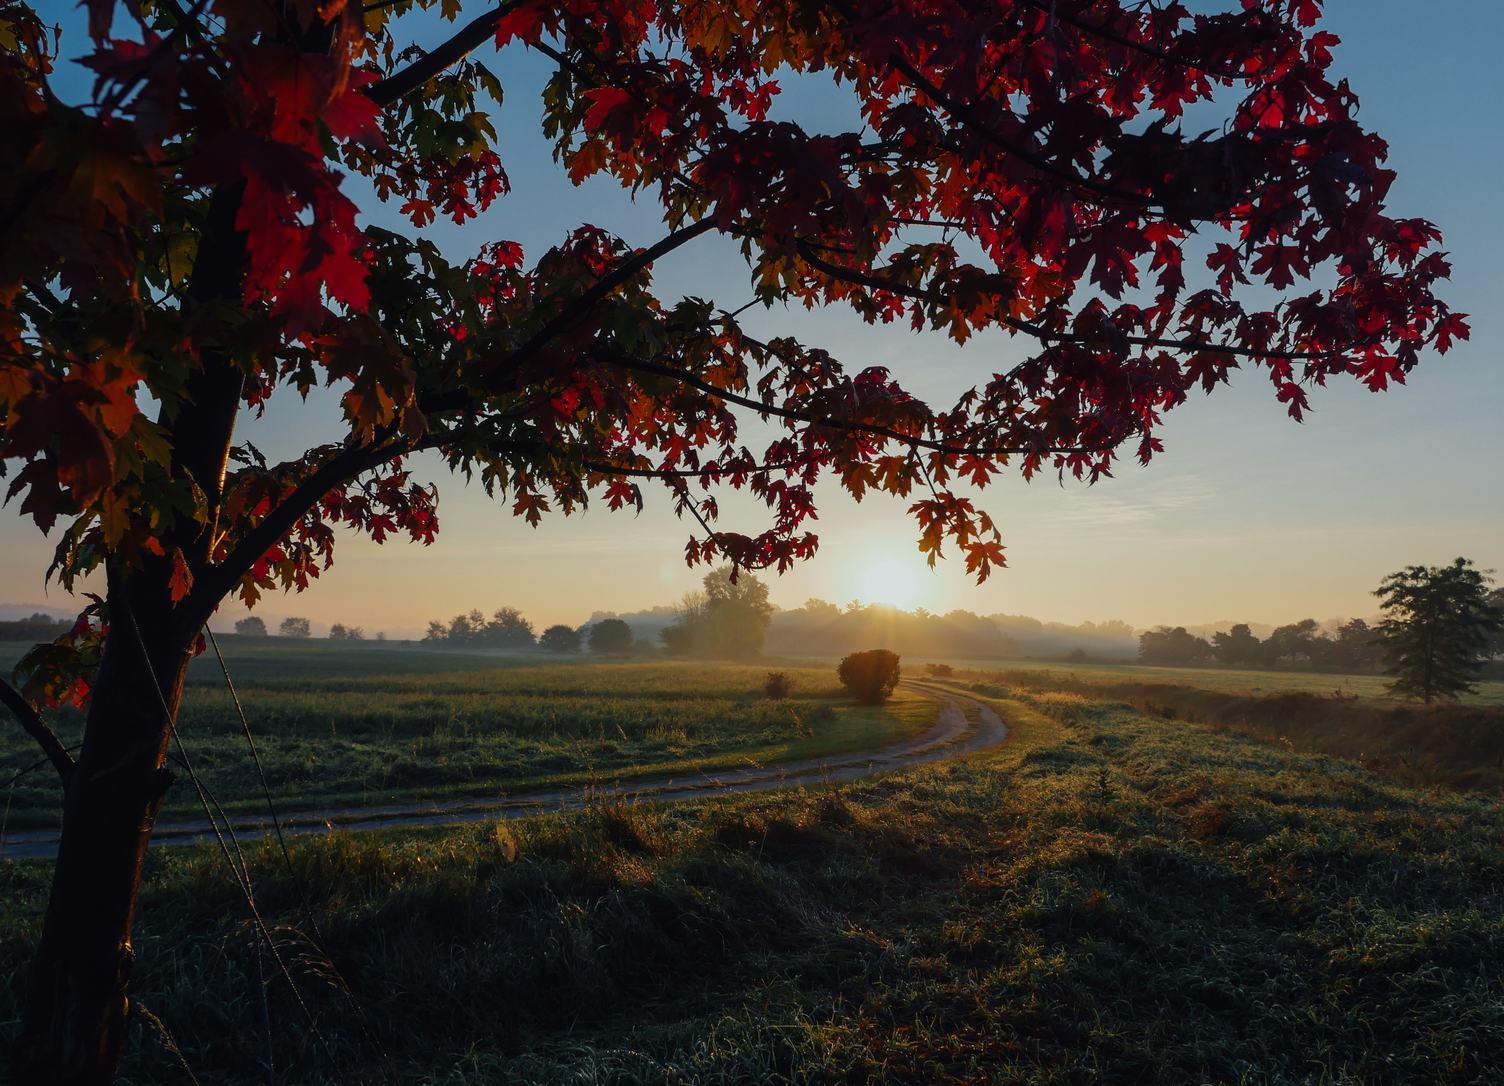 Sunrise on an Empty Rural Road